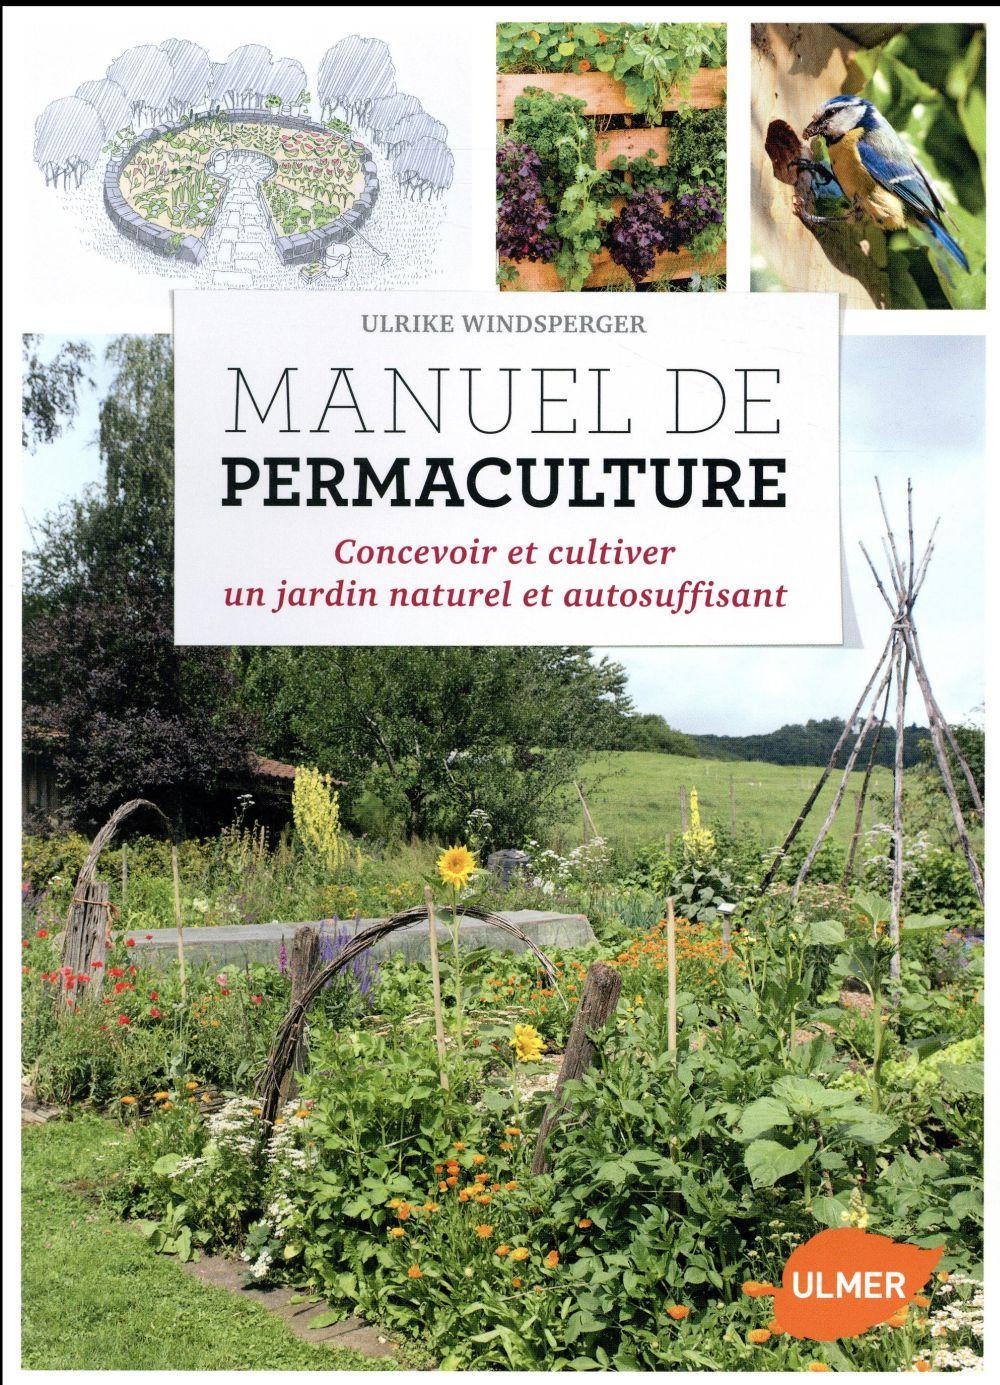 MANUEL DE PERMACULTURE WINDSPERGER ULRIKE ULMER